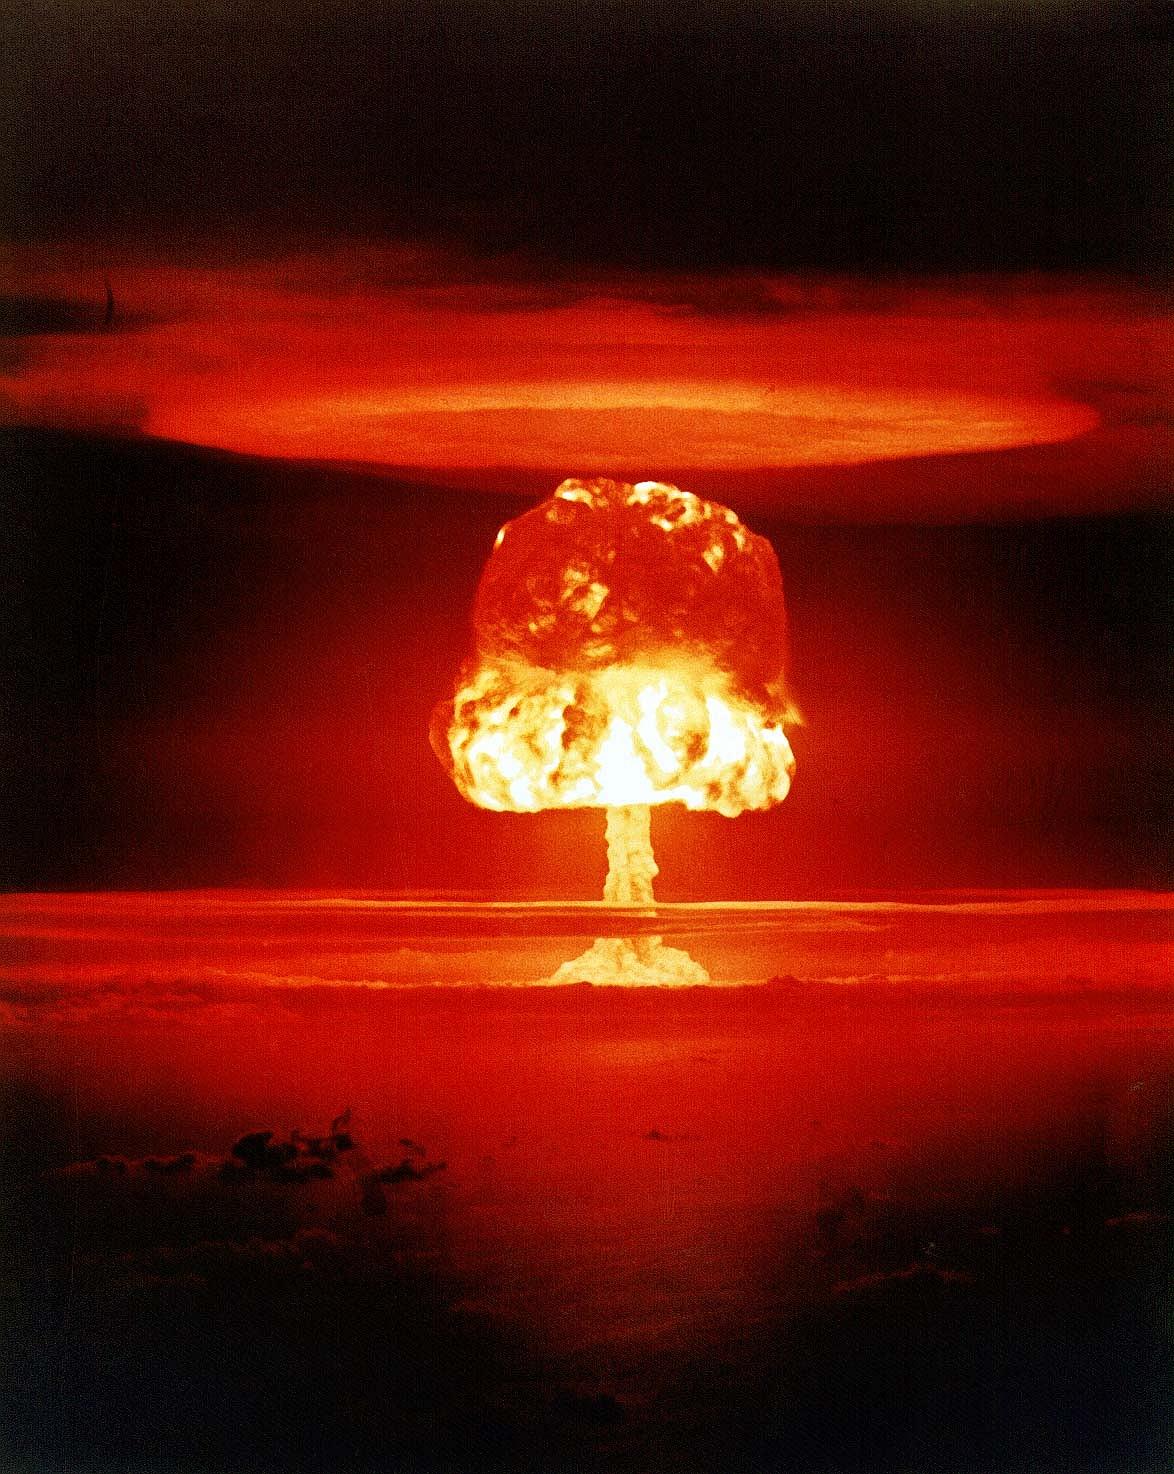 https://i2.wp.com/chamorrobible.org/images/photos/gpw-20050304-UnitedStatesDepartmentOfEnergy-XX-33-thermonuclear-hydrogen-bomb-Operation-Castle-ROMEO-Event-Bikini-Atoll-Marshall-Islands-19540327-large.jpg